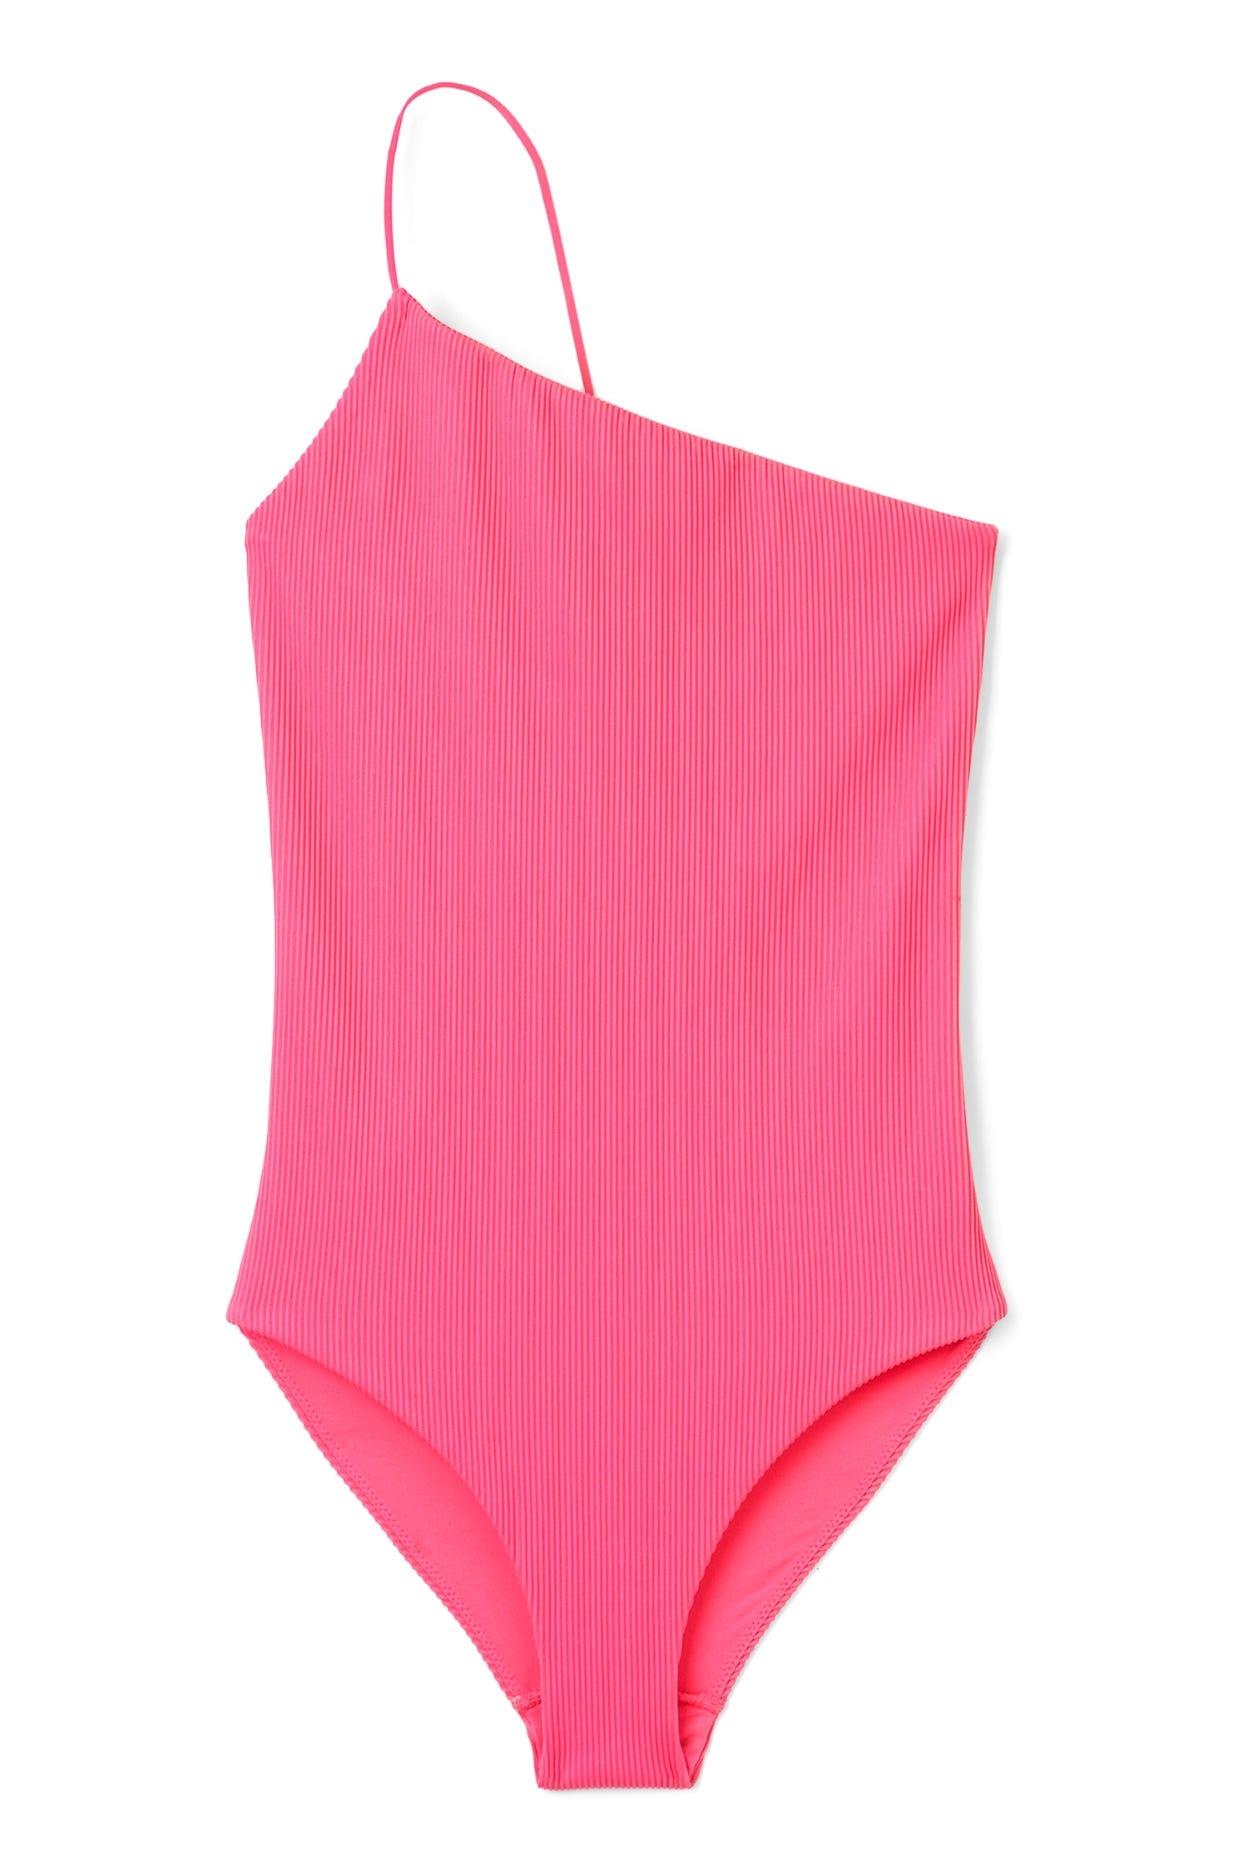 b9c16666c2aad Spring Summer Swimwear Bikinis Swimsuits